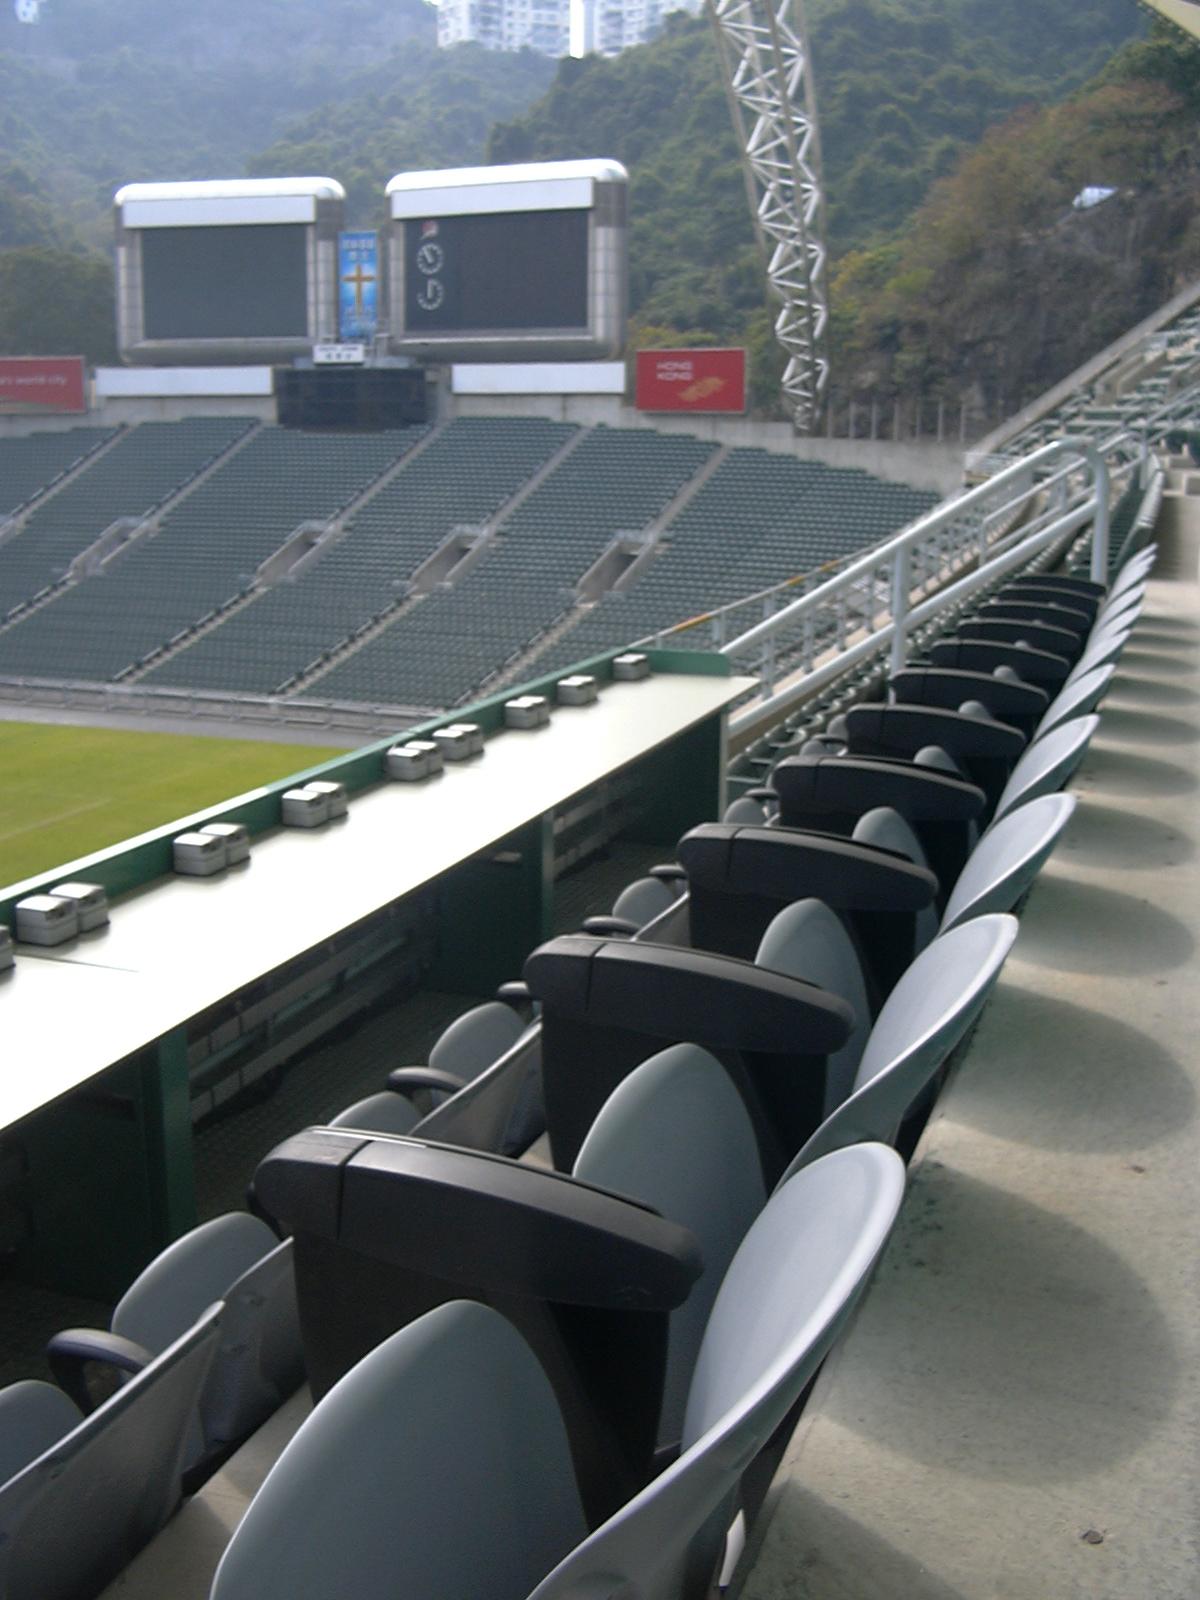 HK Stadium Press Seating 018.jpg